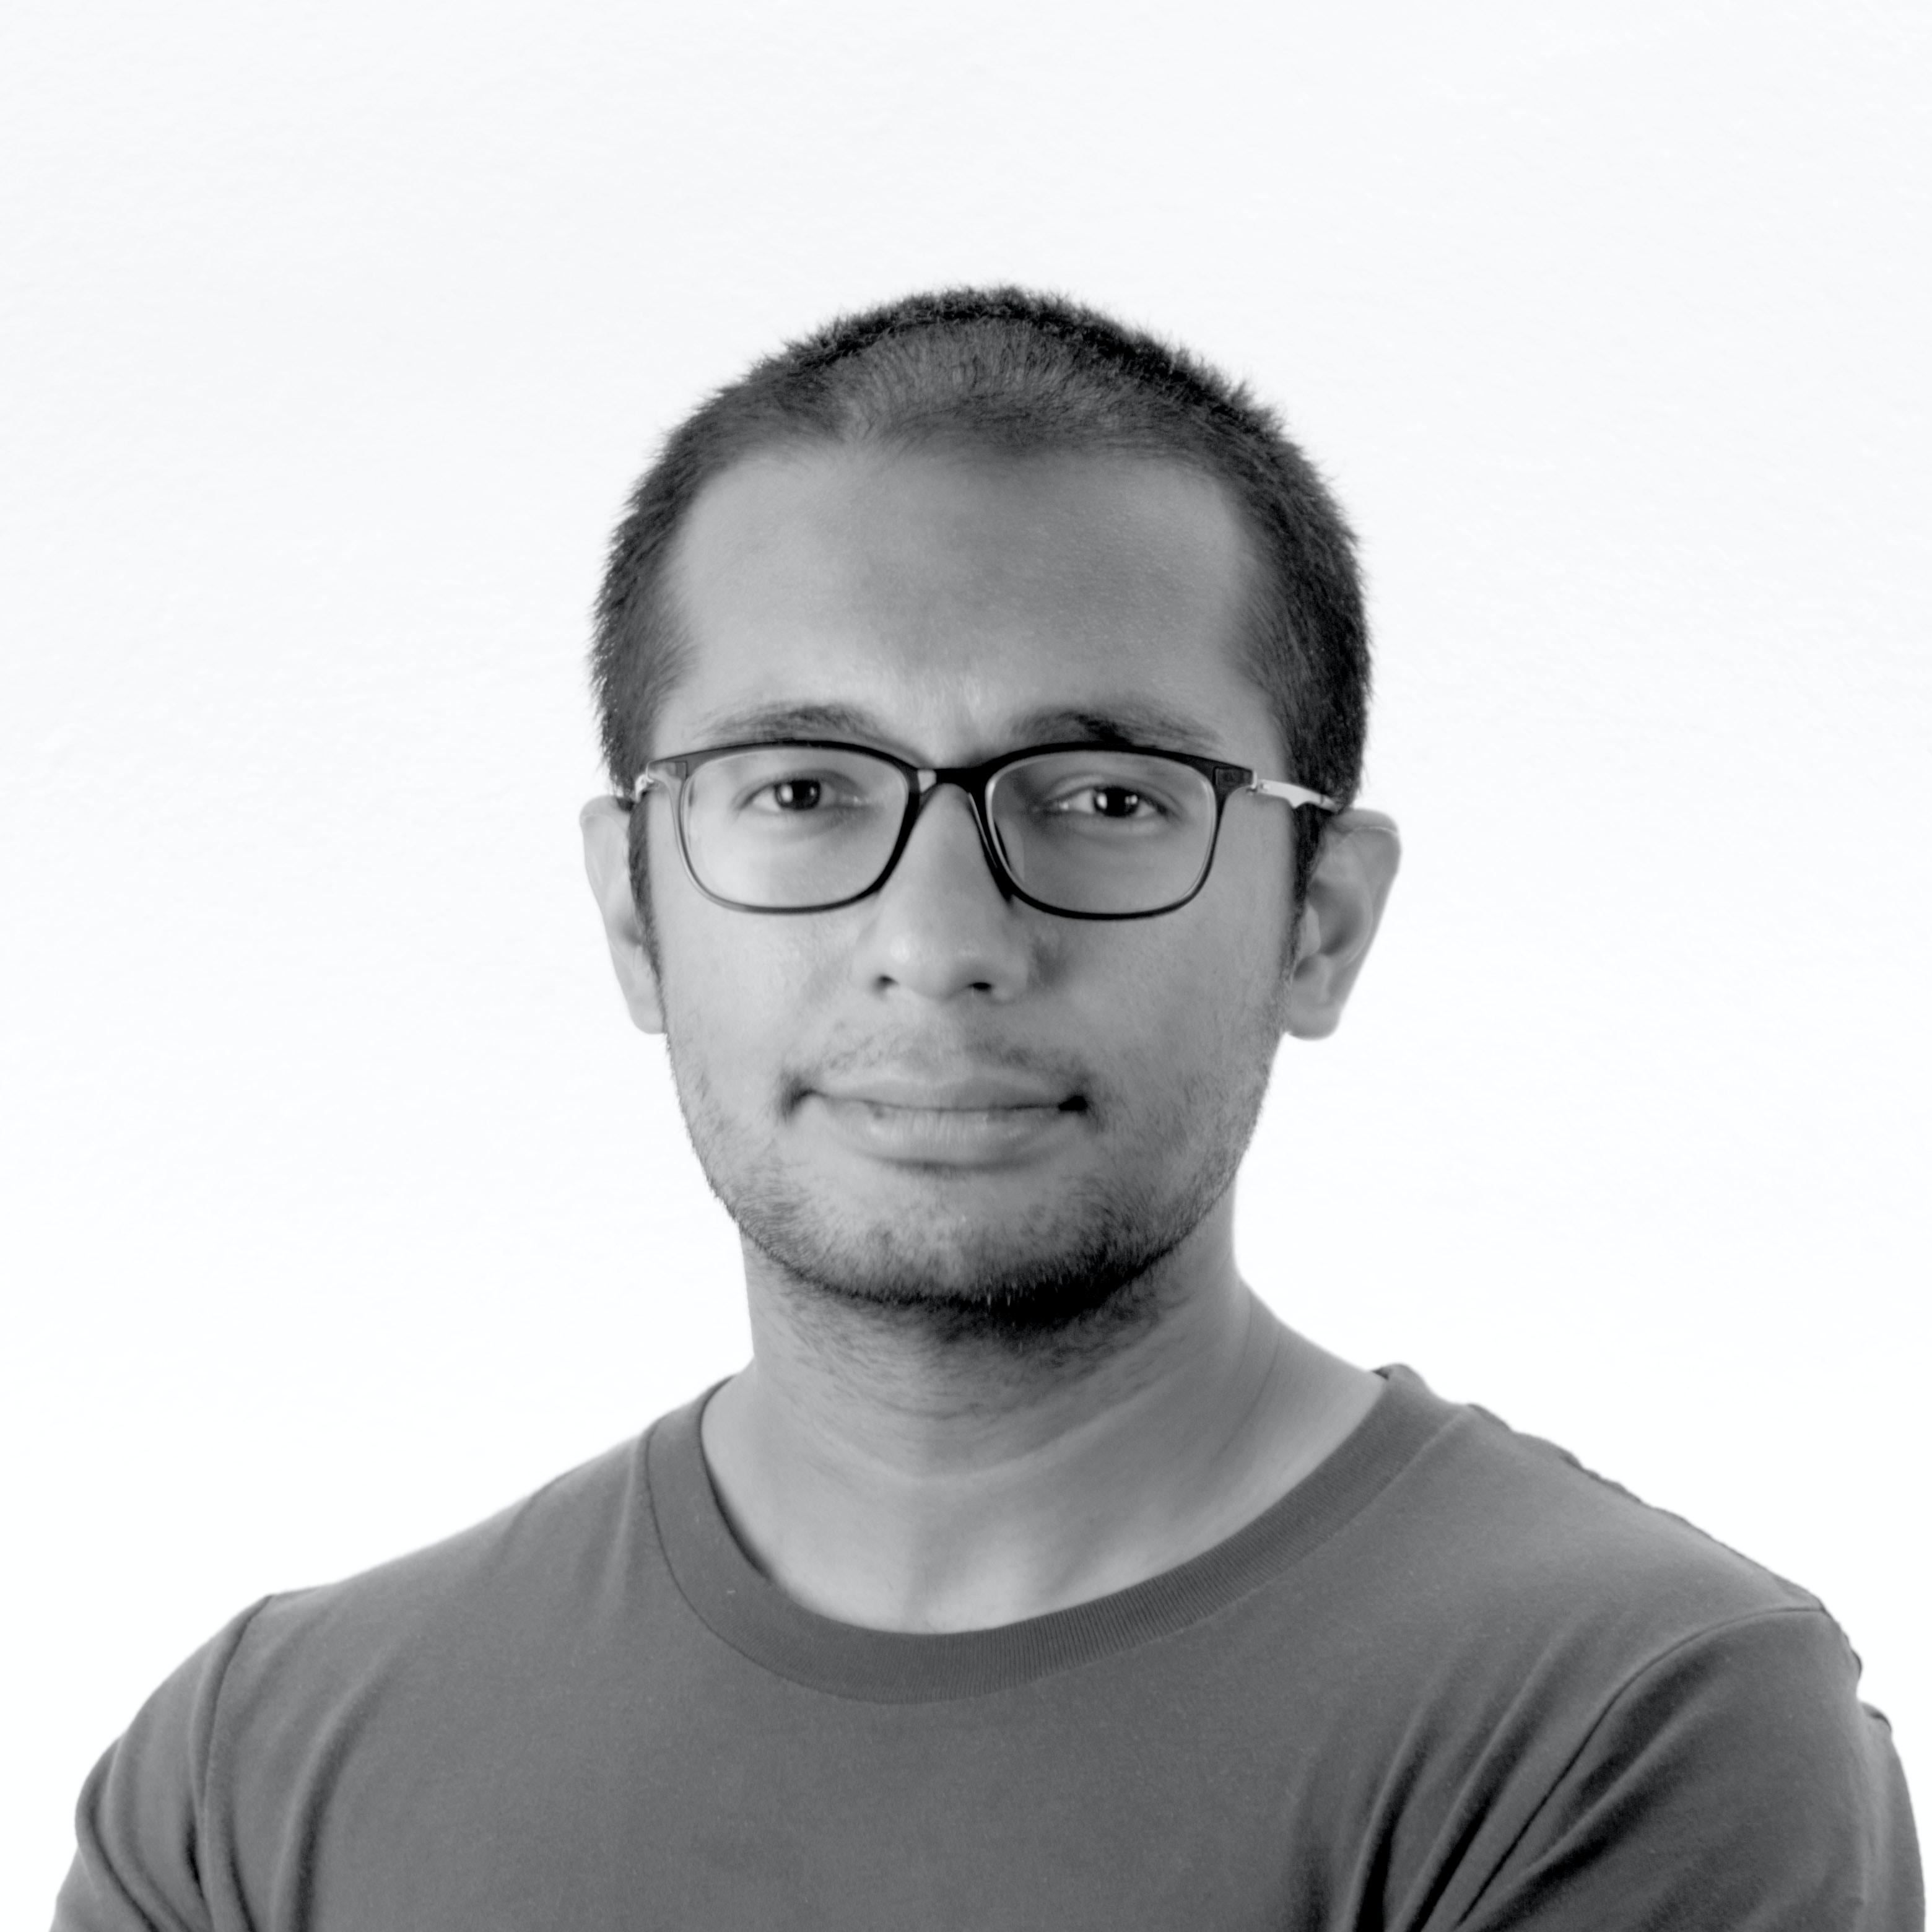 Avatar of user Akshay Chauhan